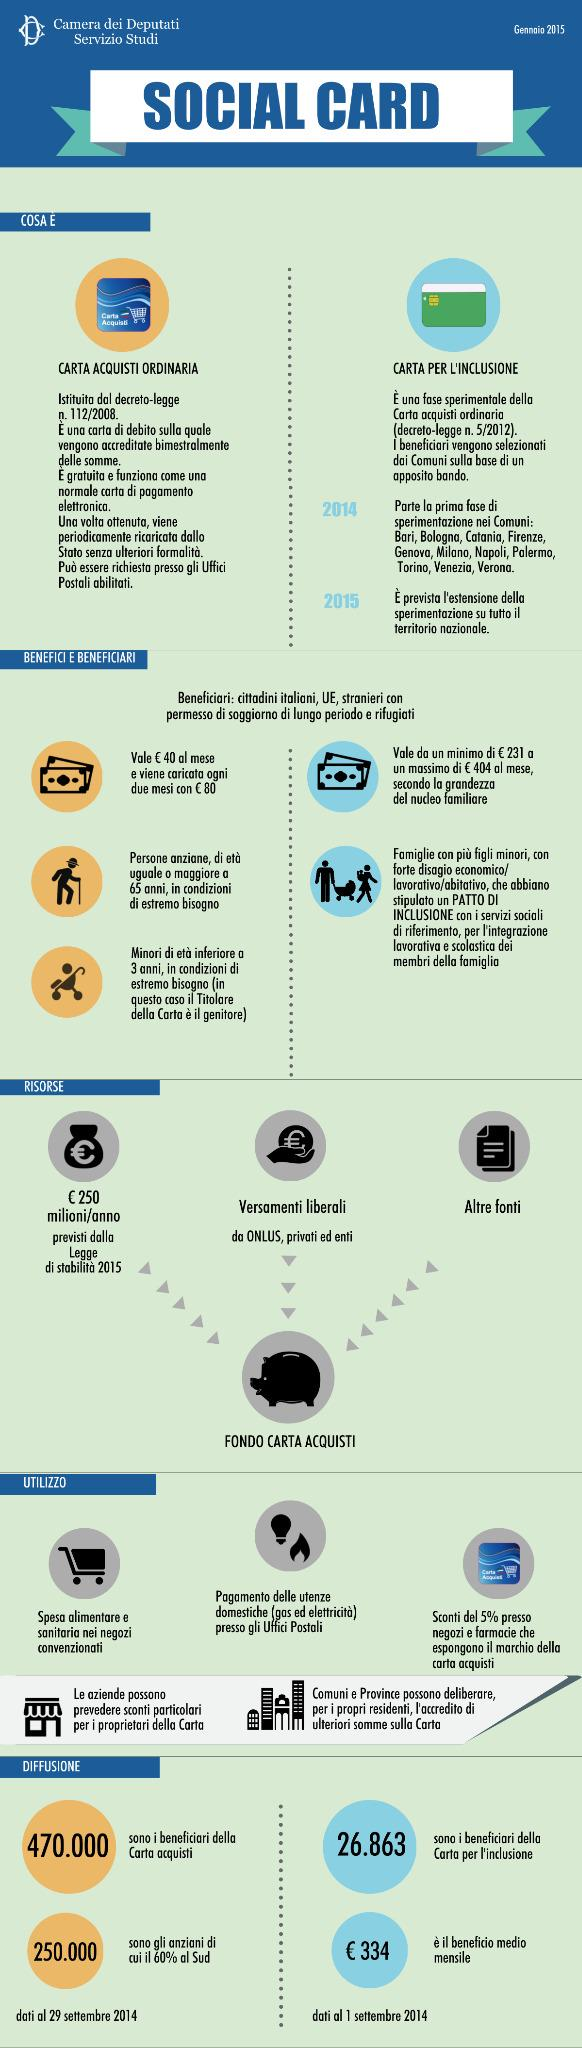 infografica-social-card